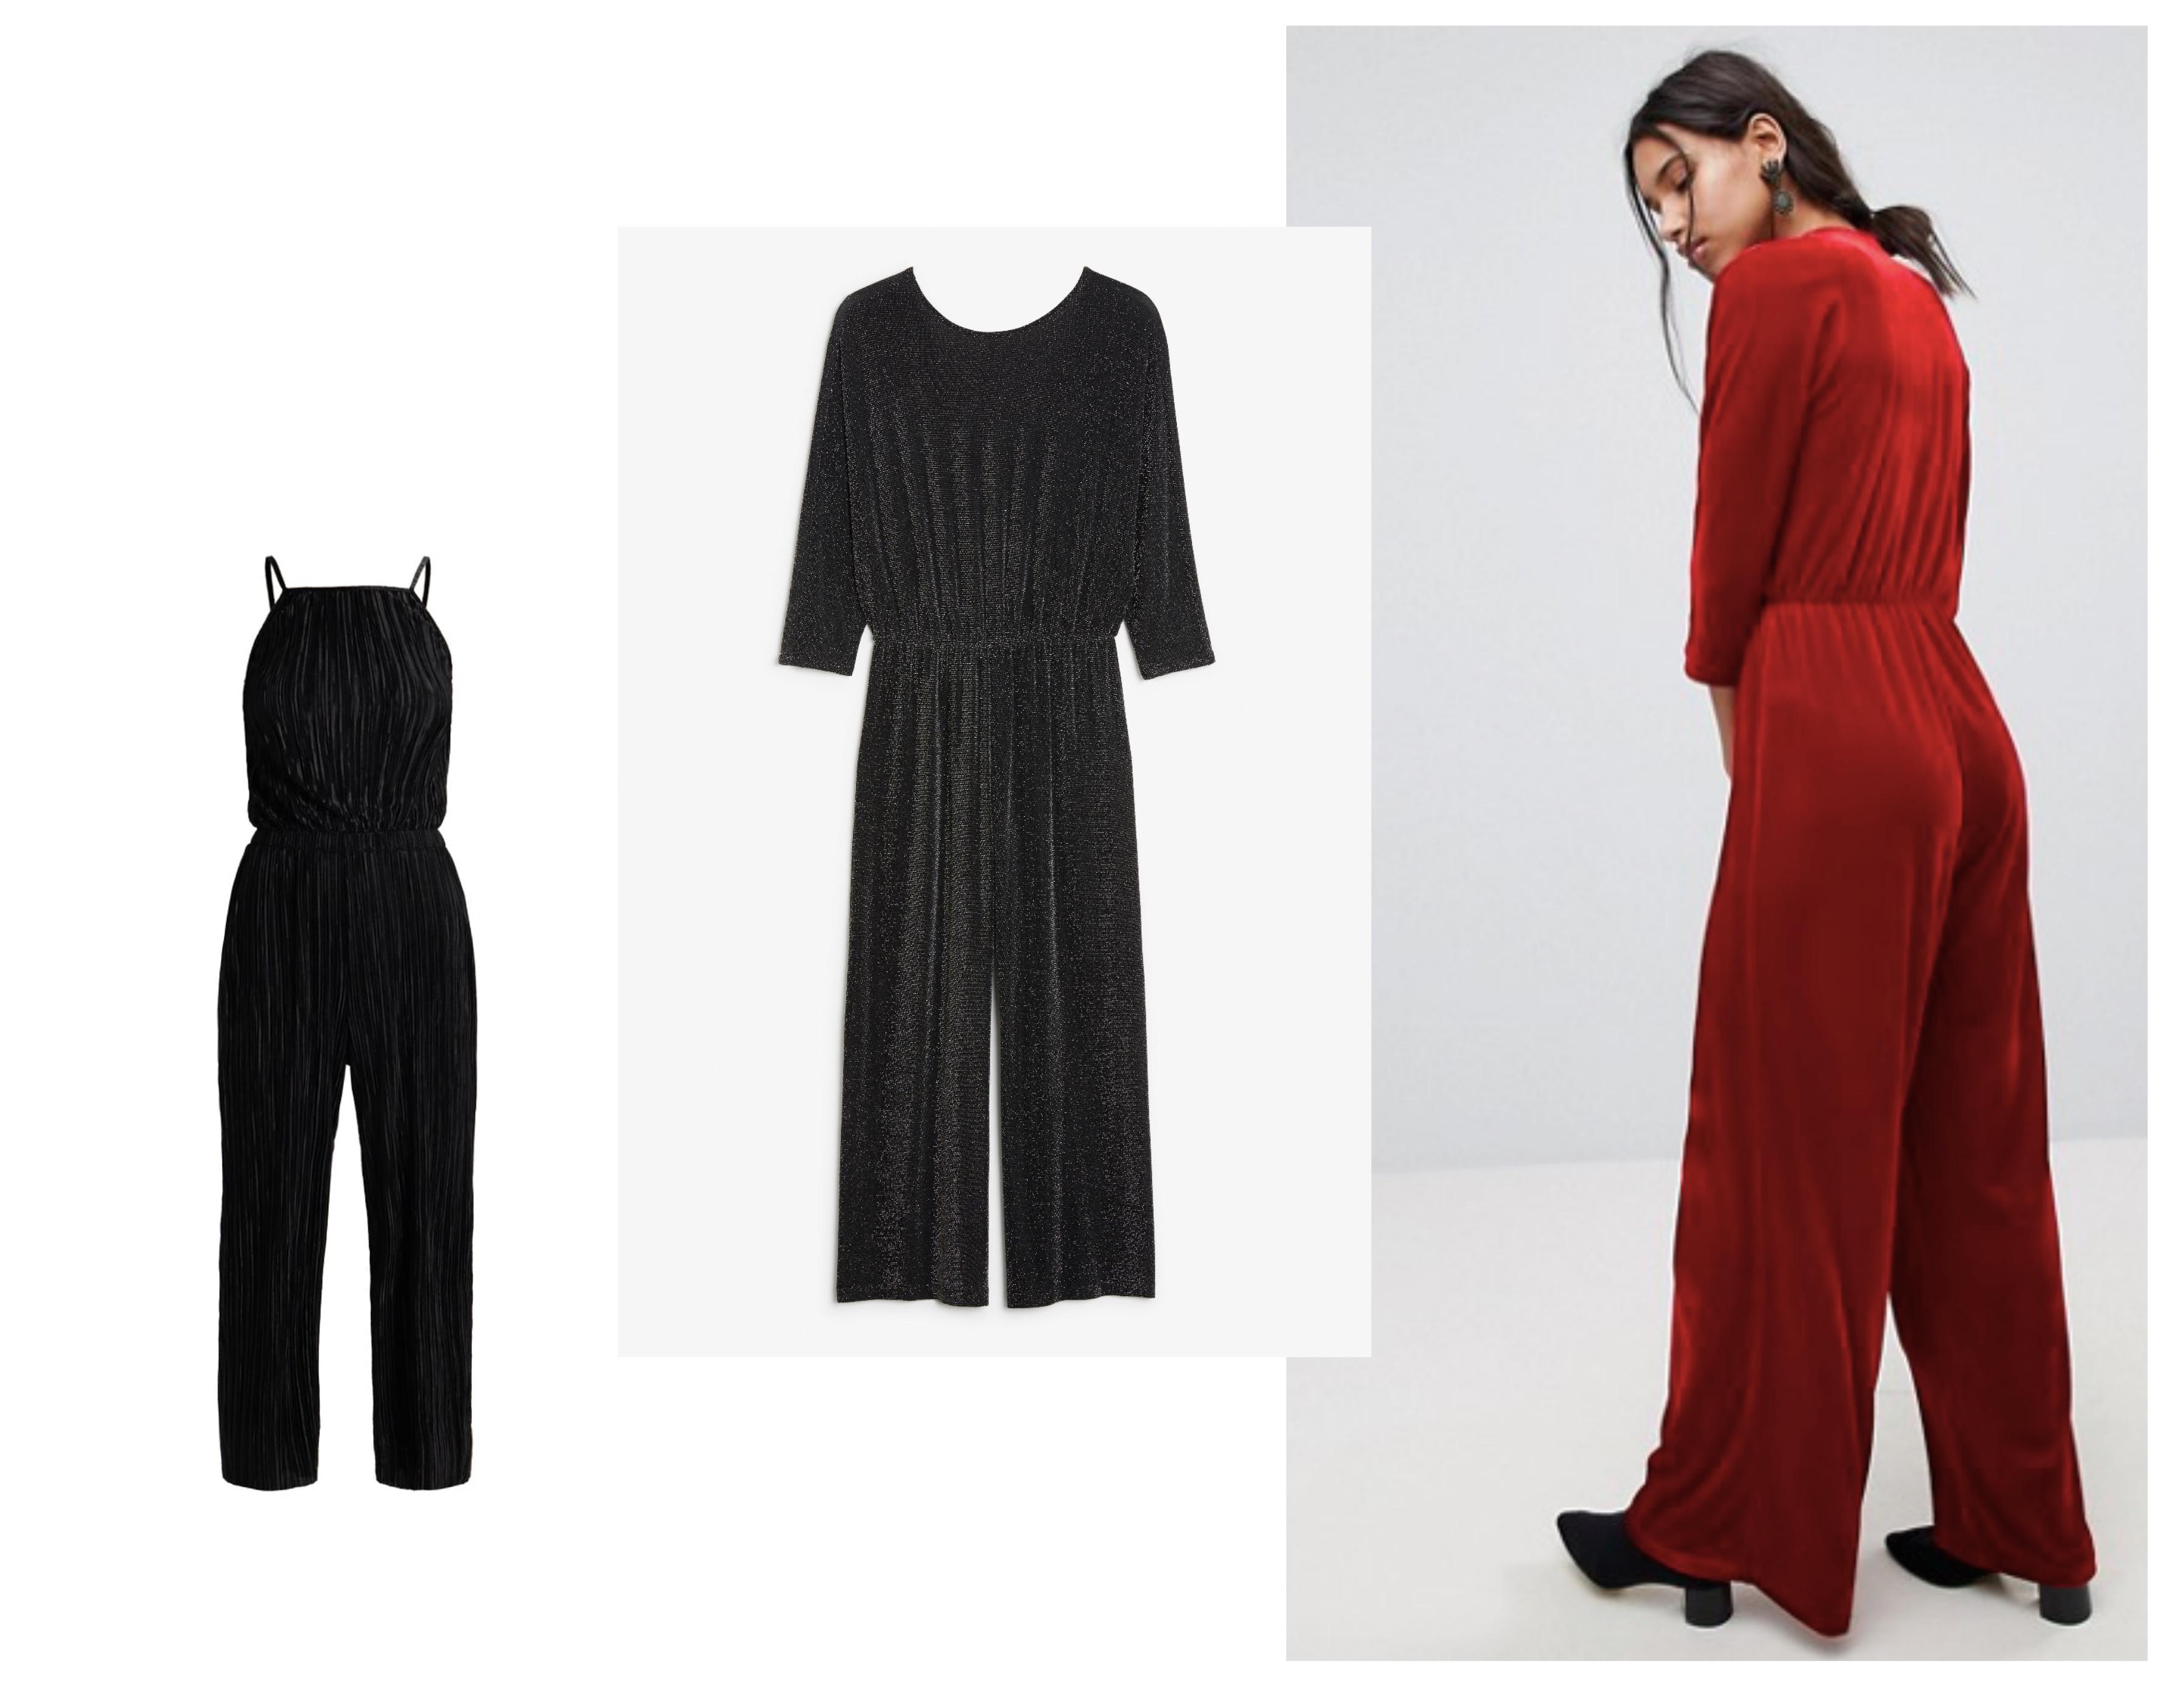 5c87315b Fra venstre: Svart jumpsuit i plissé fra New Look via Zalando (299,-) /  Jumpsuit i glitter fra Monki (ca 300,-) / Rød jumpsuit i velur fra Asos (ca  400,-)